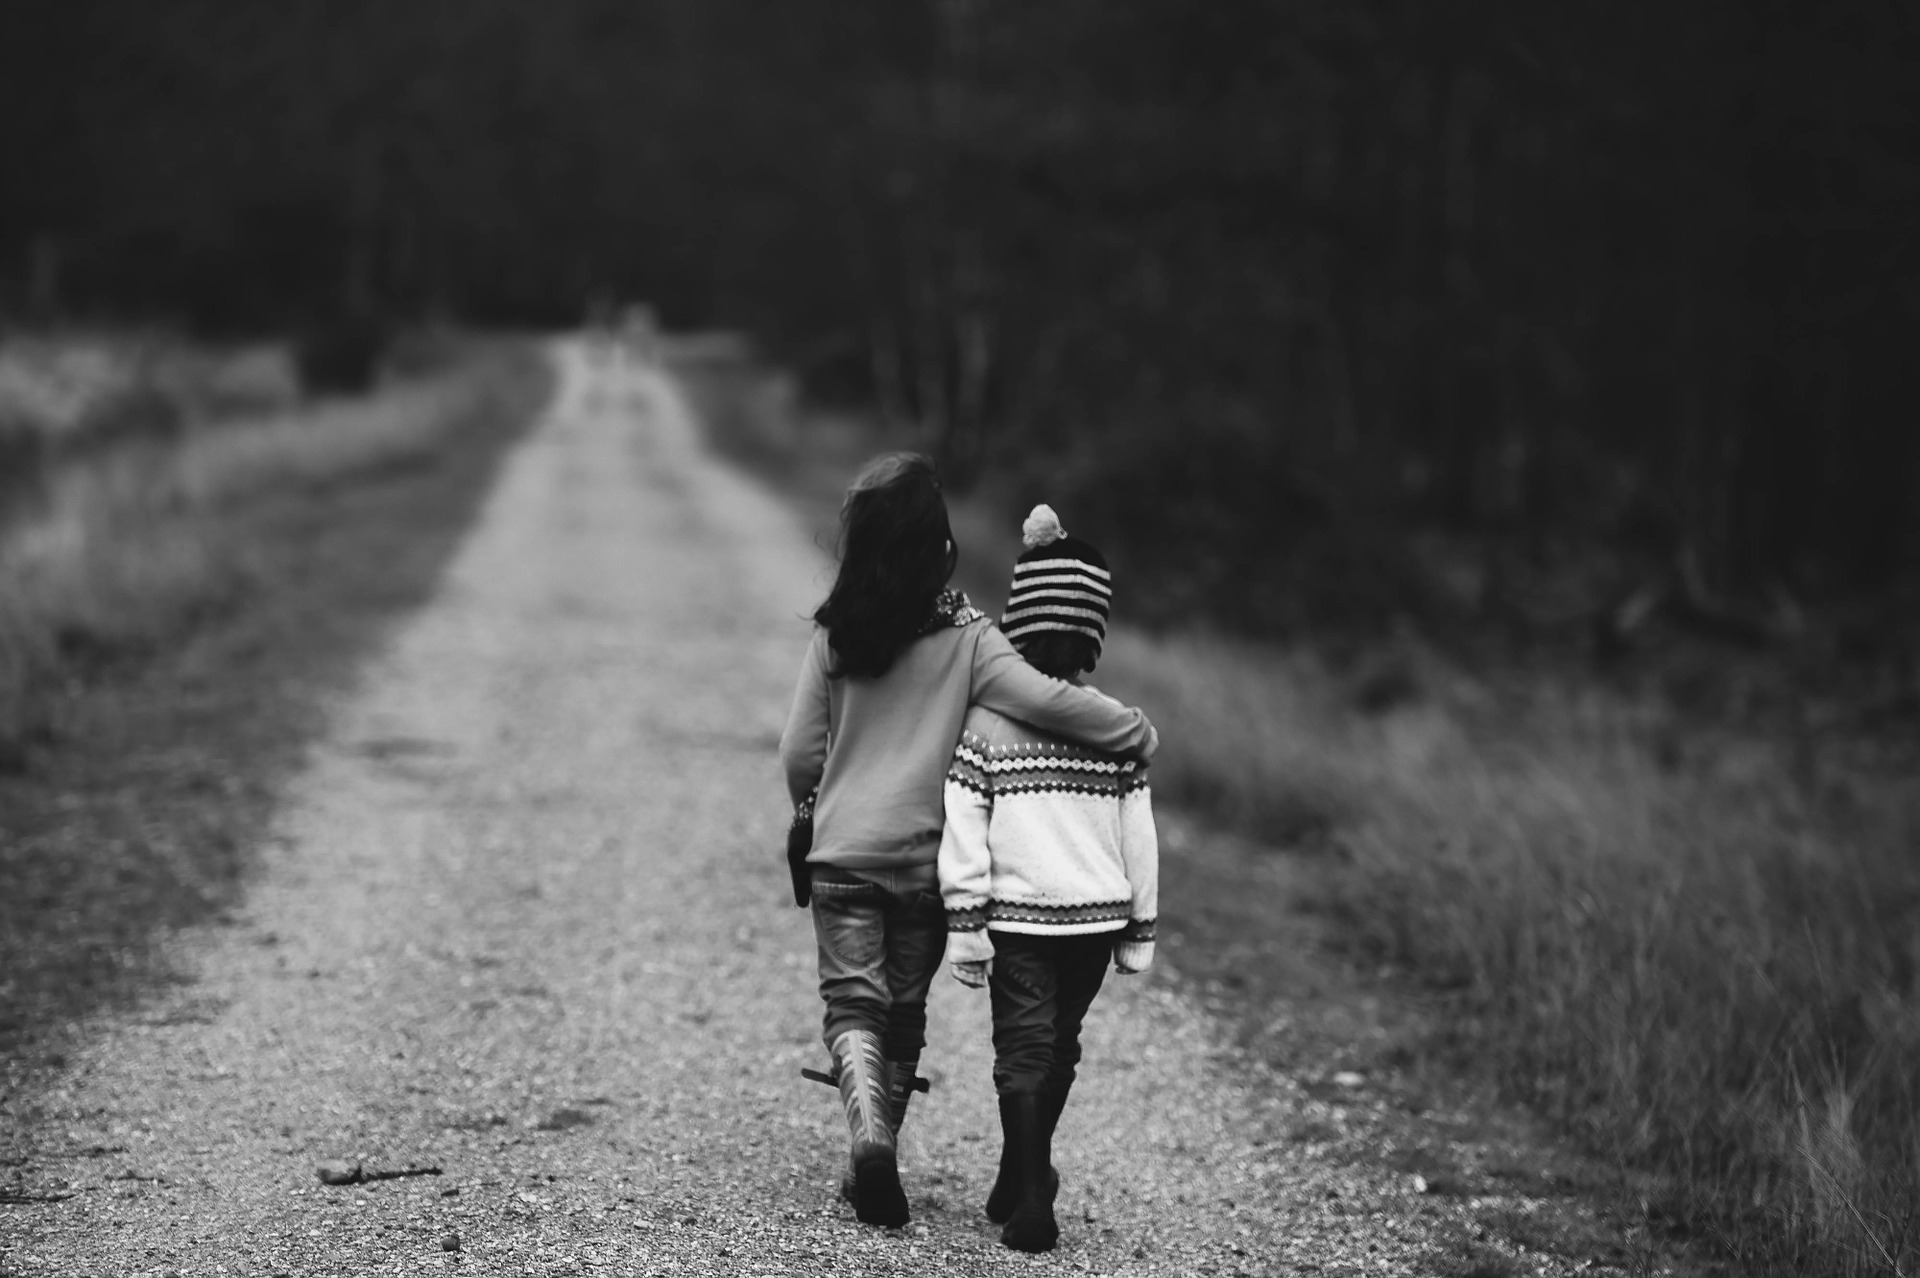 Kinder auf dem Weg